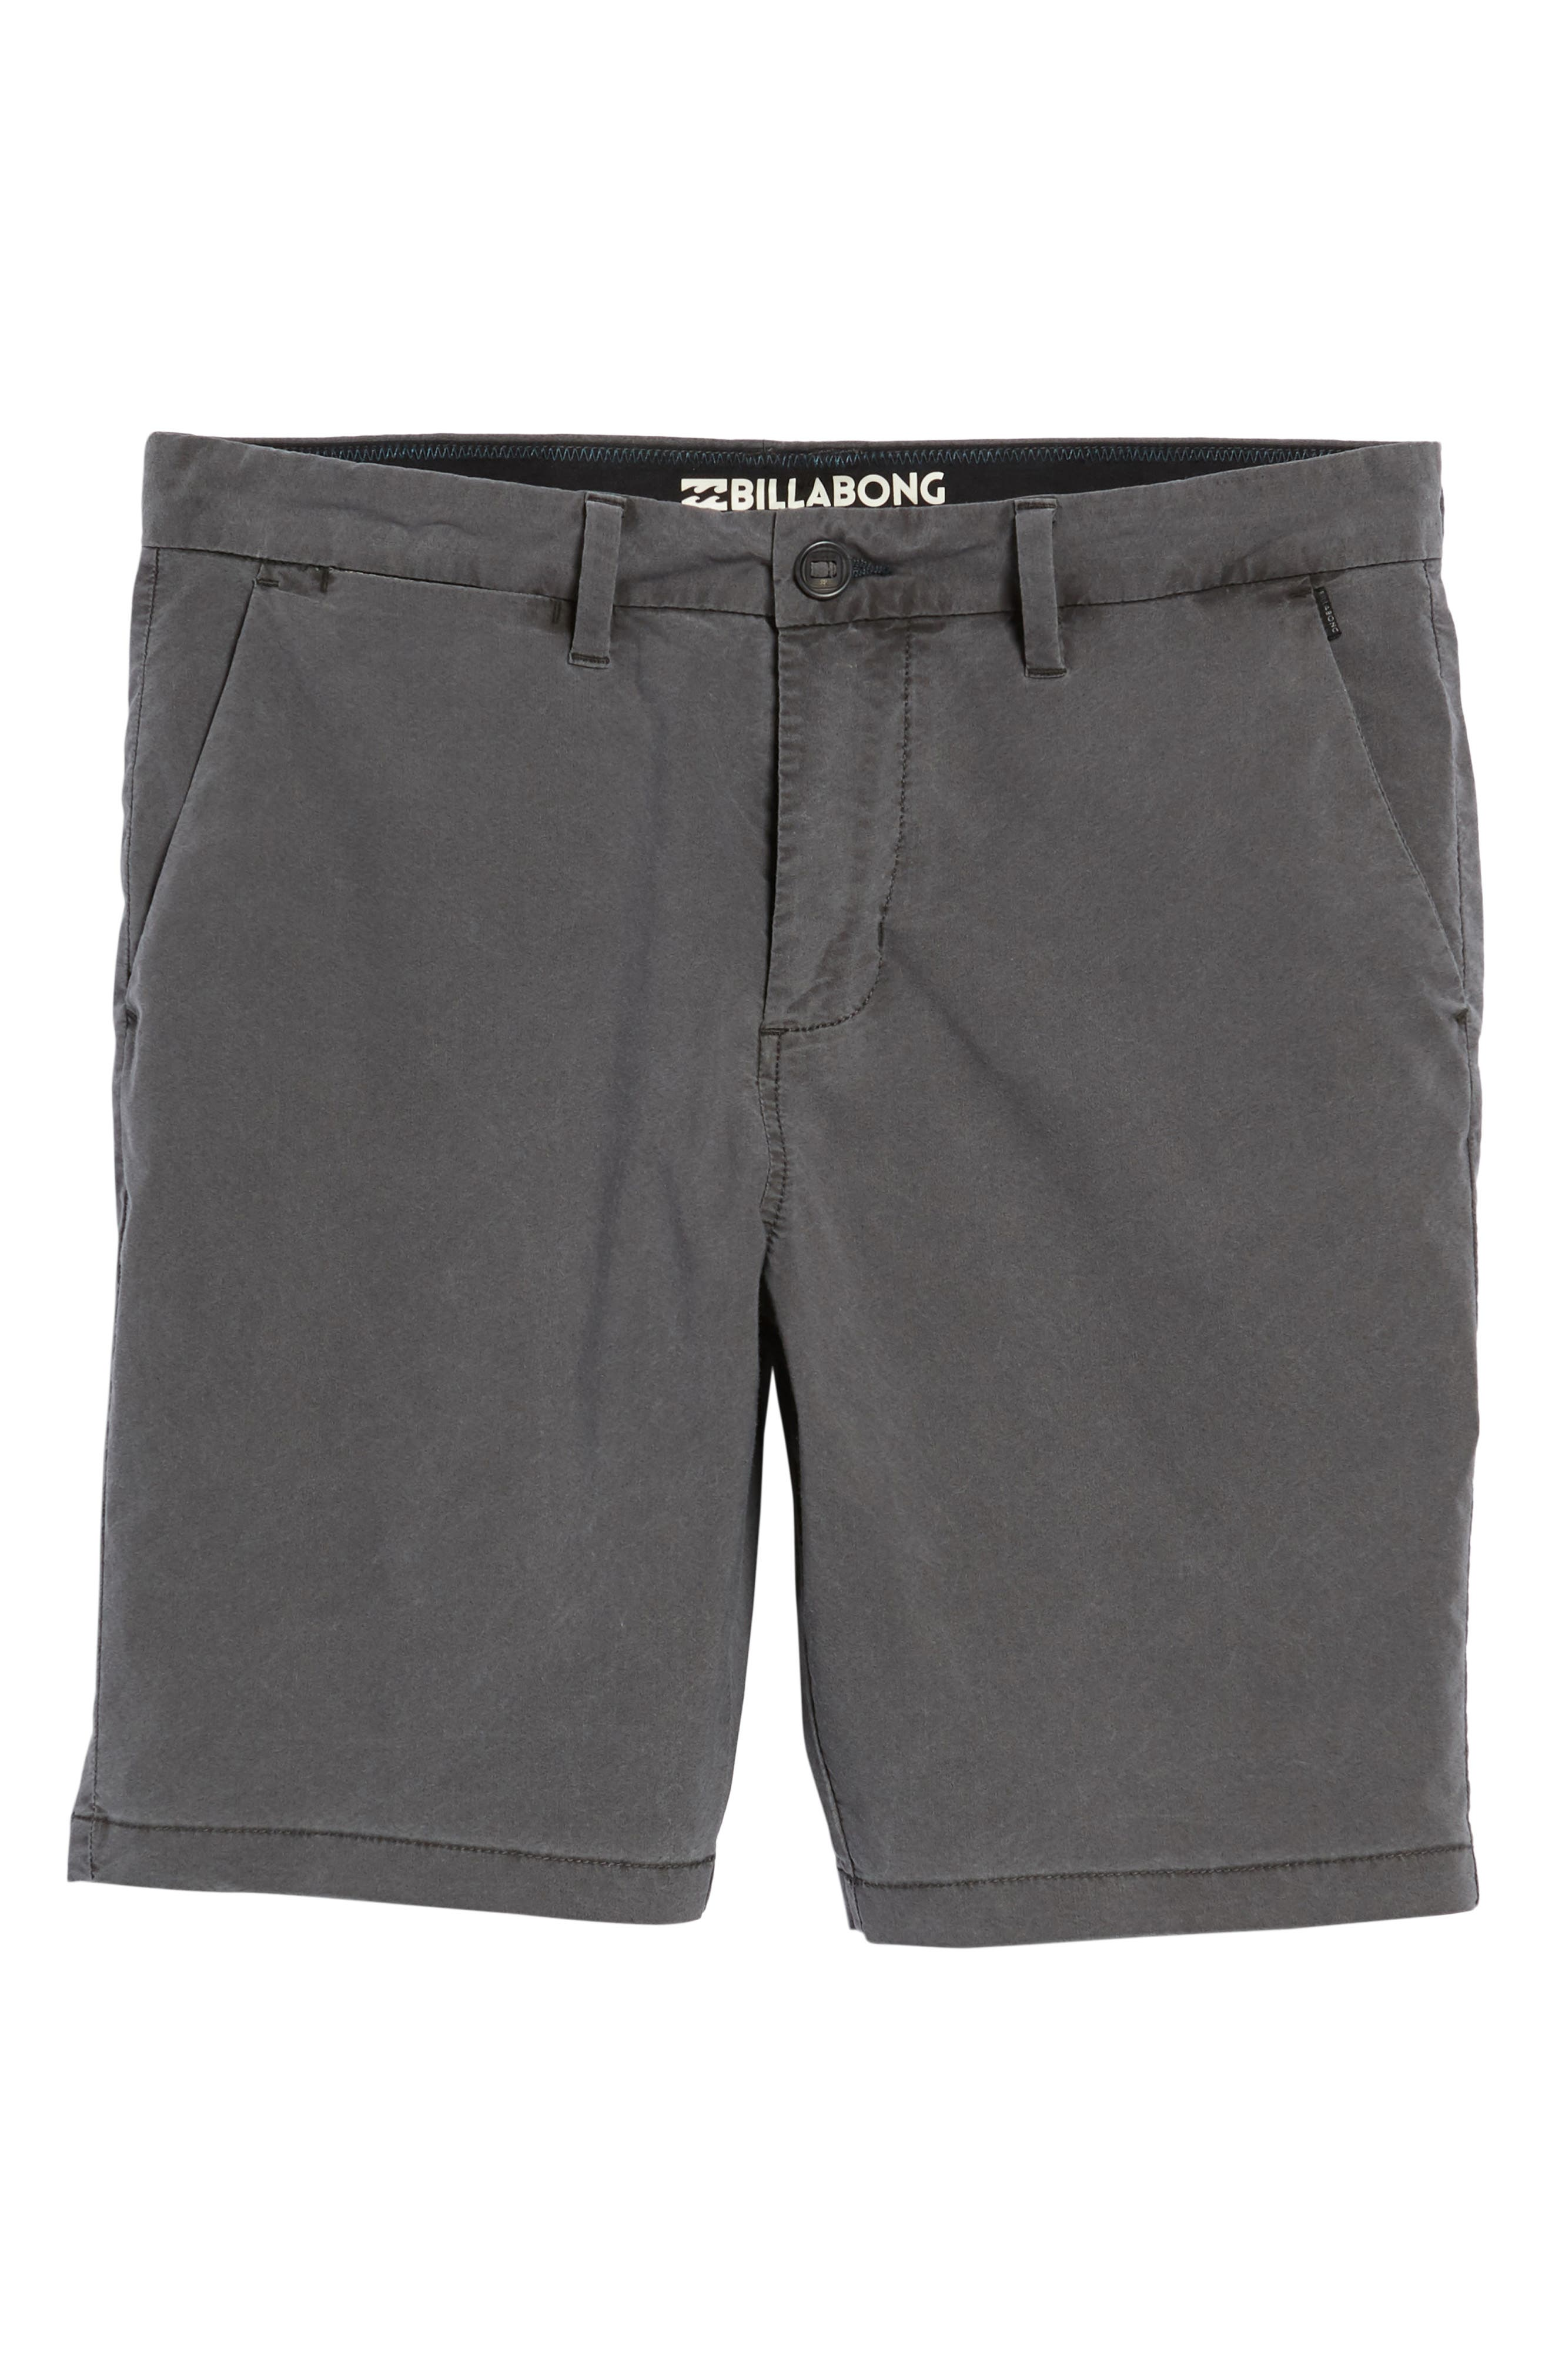 BILLABONG,                             New Order X Overdye Hybrid Shorts,                             Alternate thumbnail 6, color,                             001